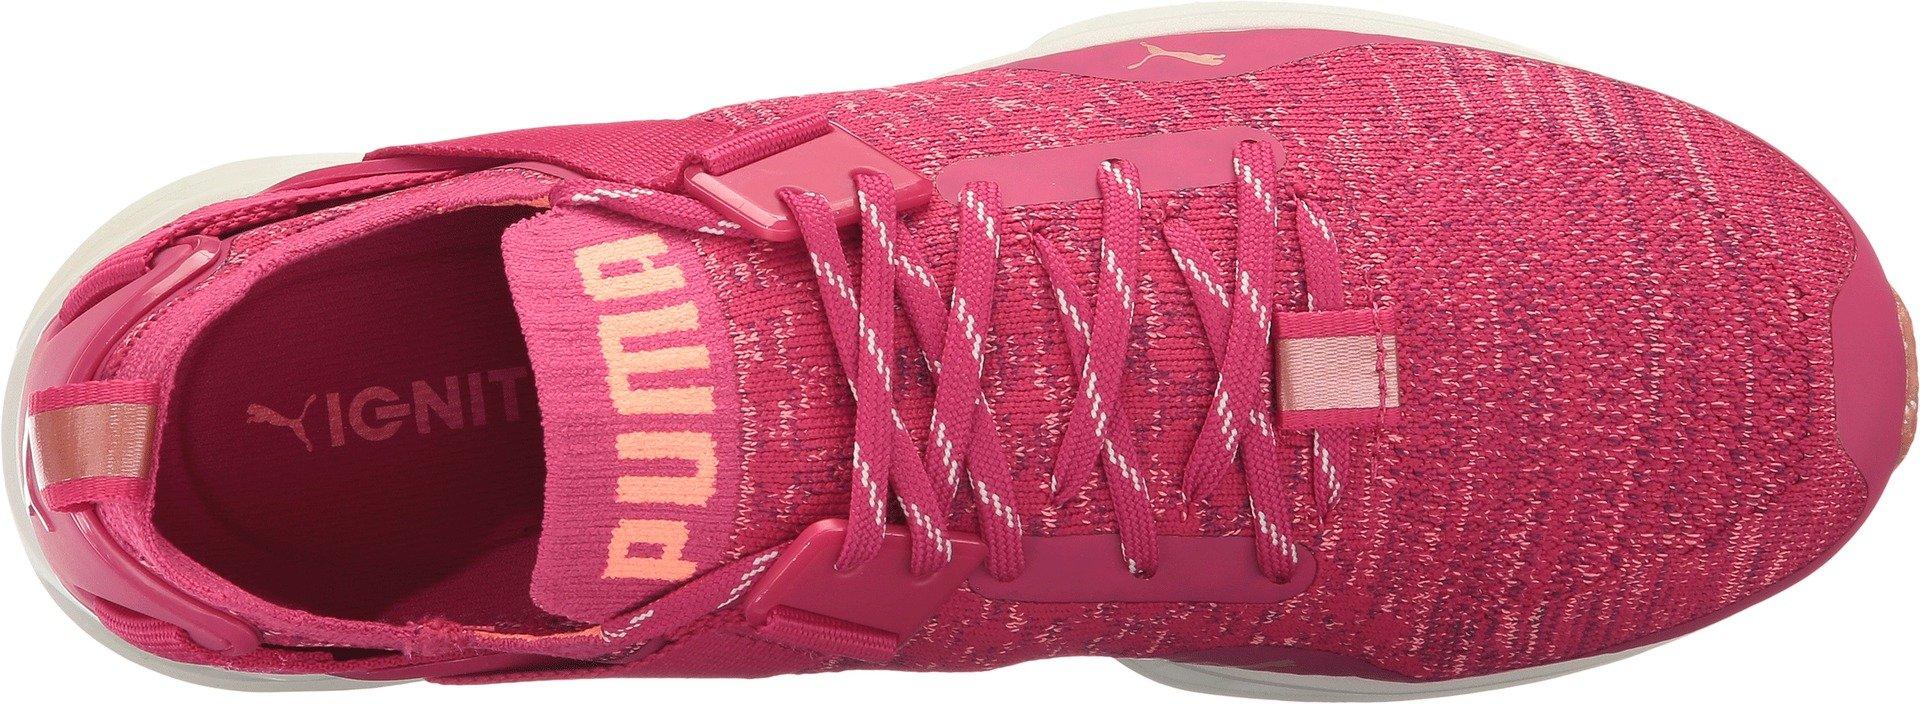 Galleon - PUMA Women s Ignite Evoknit Lo Vr Wn Sneaker 9cee4ee6b